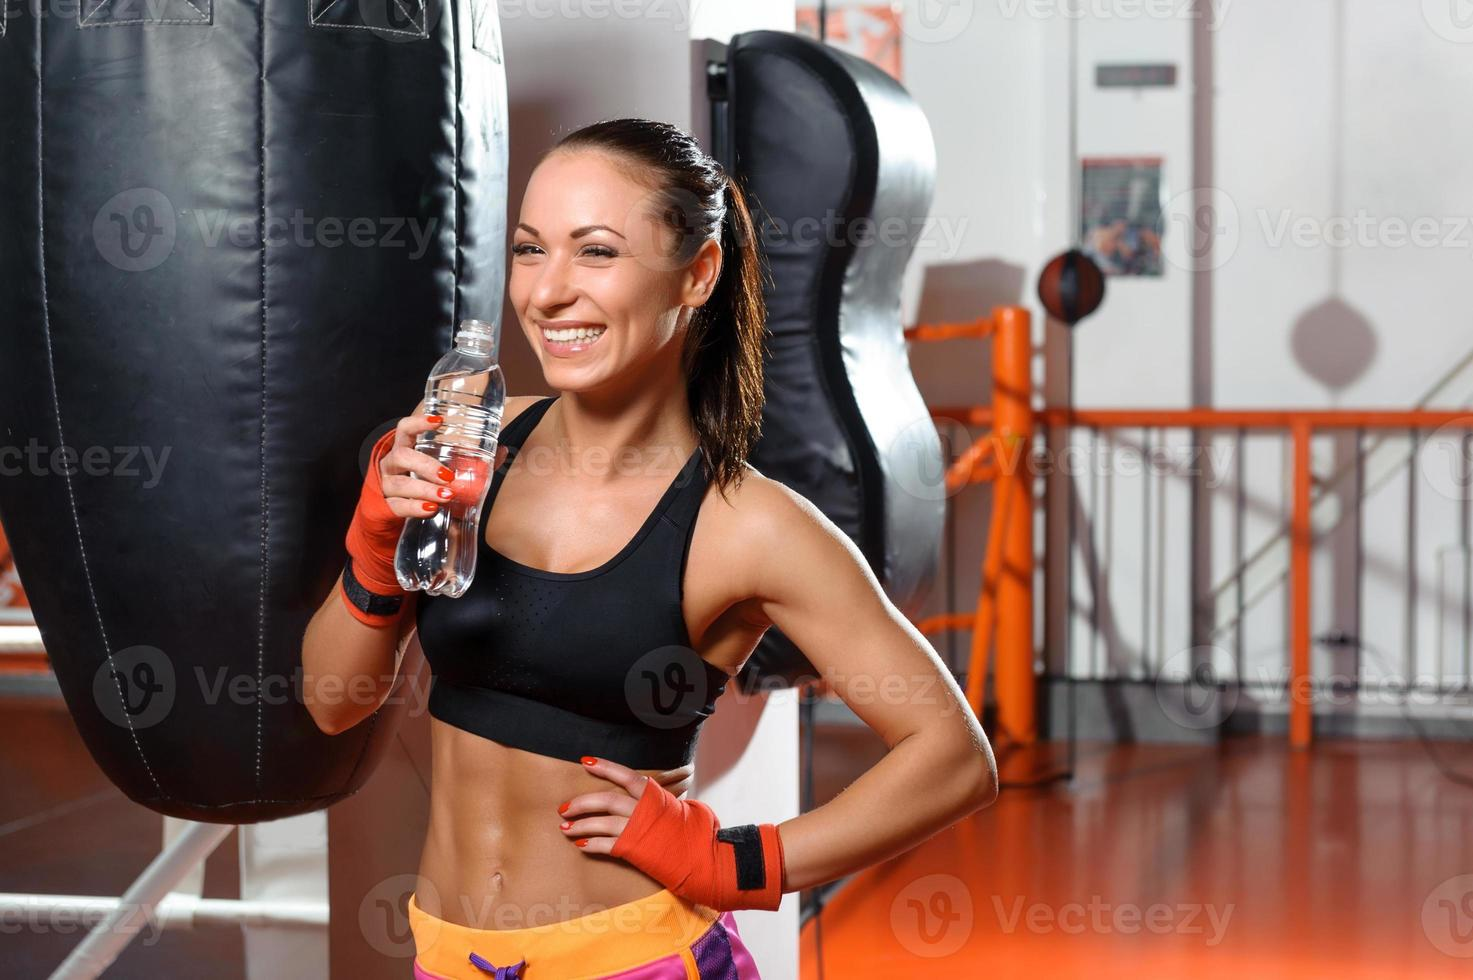 kickboxer feminino bebe água foto